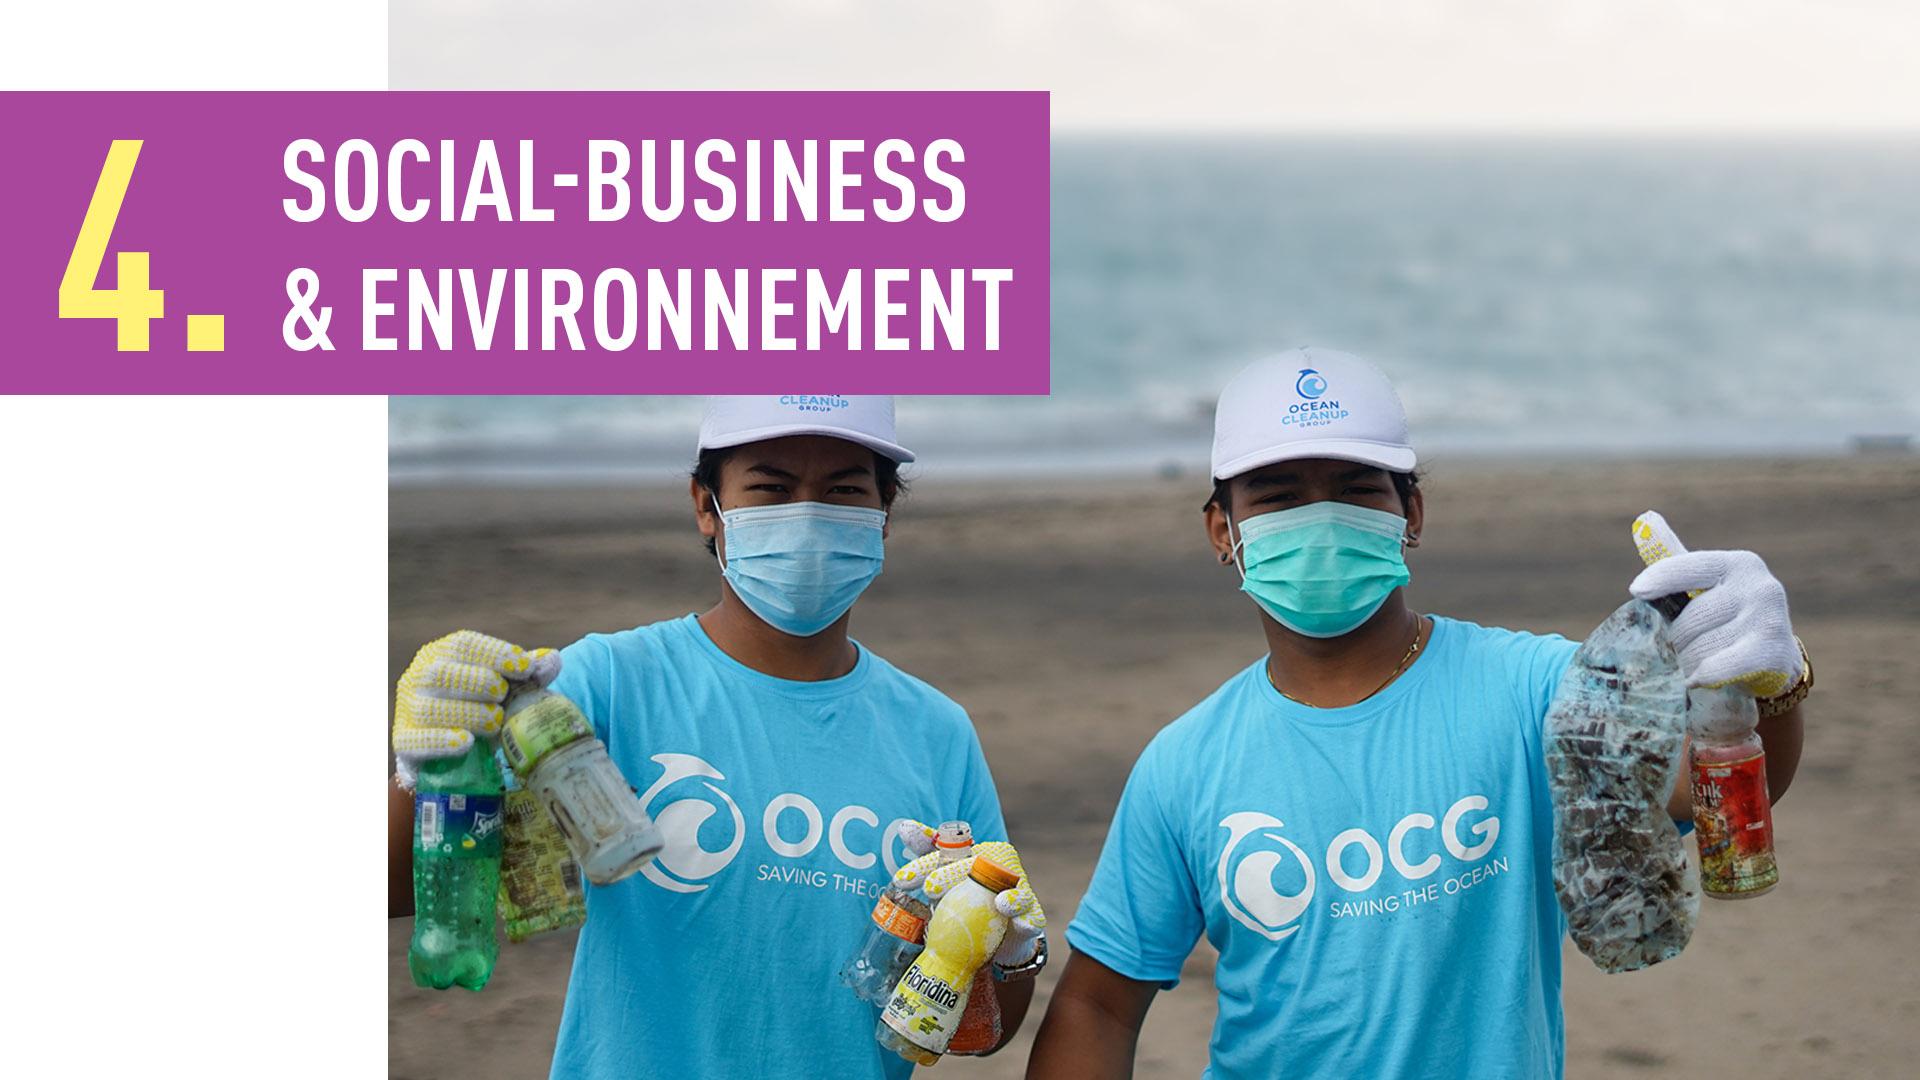 SOCIAL-BUSINESS & ENVIRONNEMENT